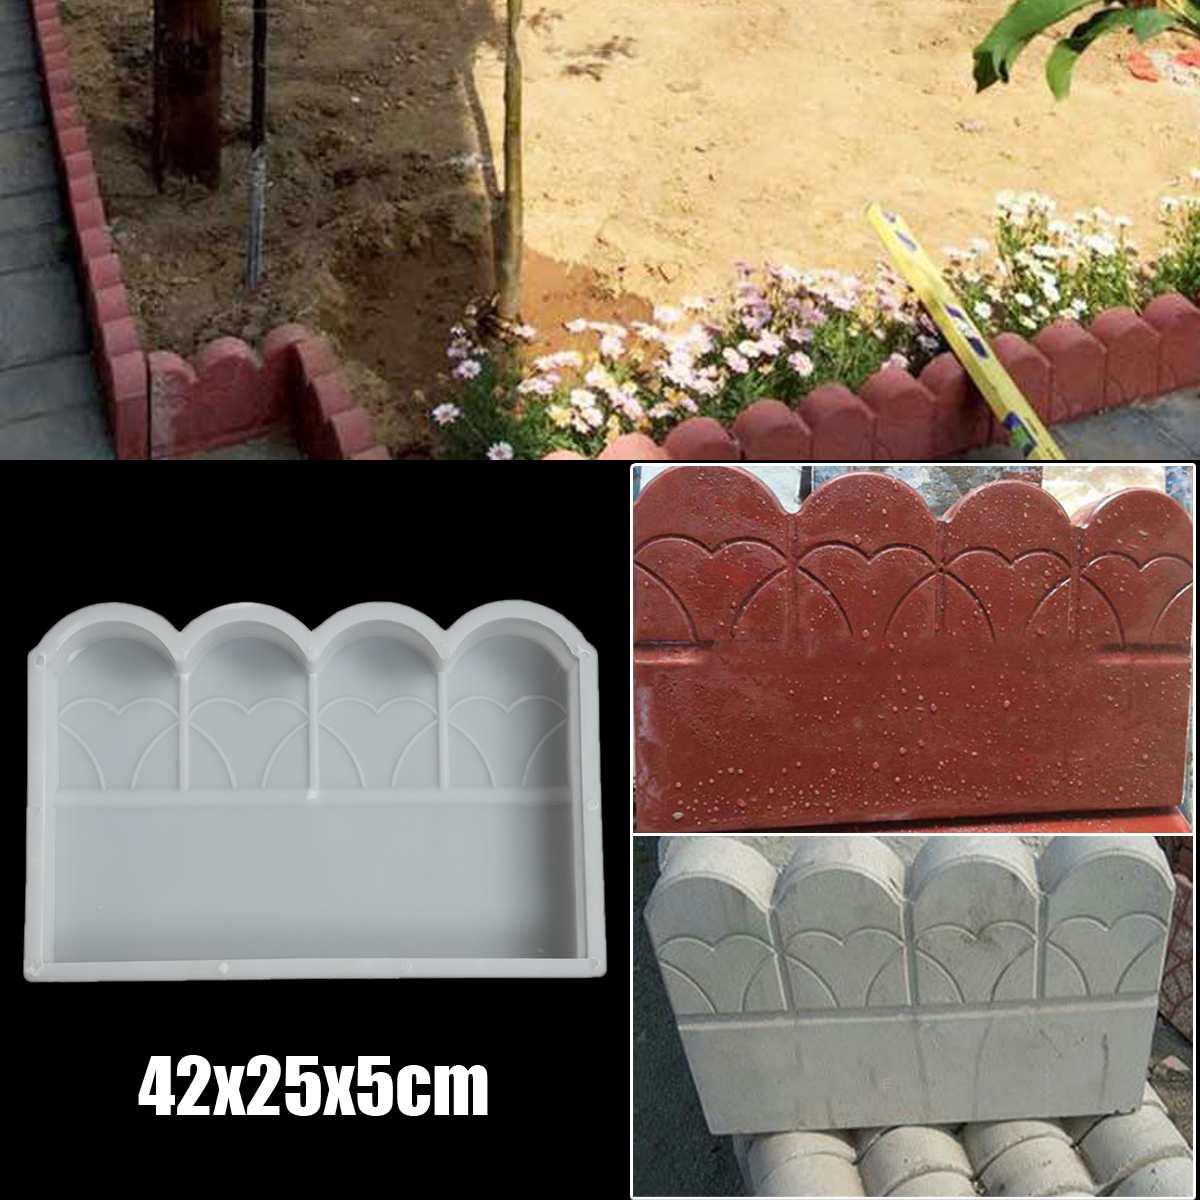 Plastic Making DIY Paving Mould Home Garden Floor Road Concrete Molds Stone Brick Path Mold Buildings Accessories 42x25x5cm